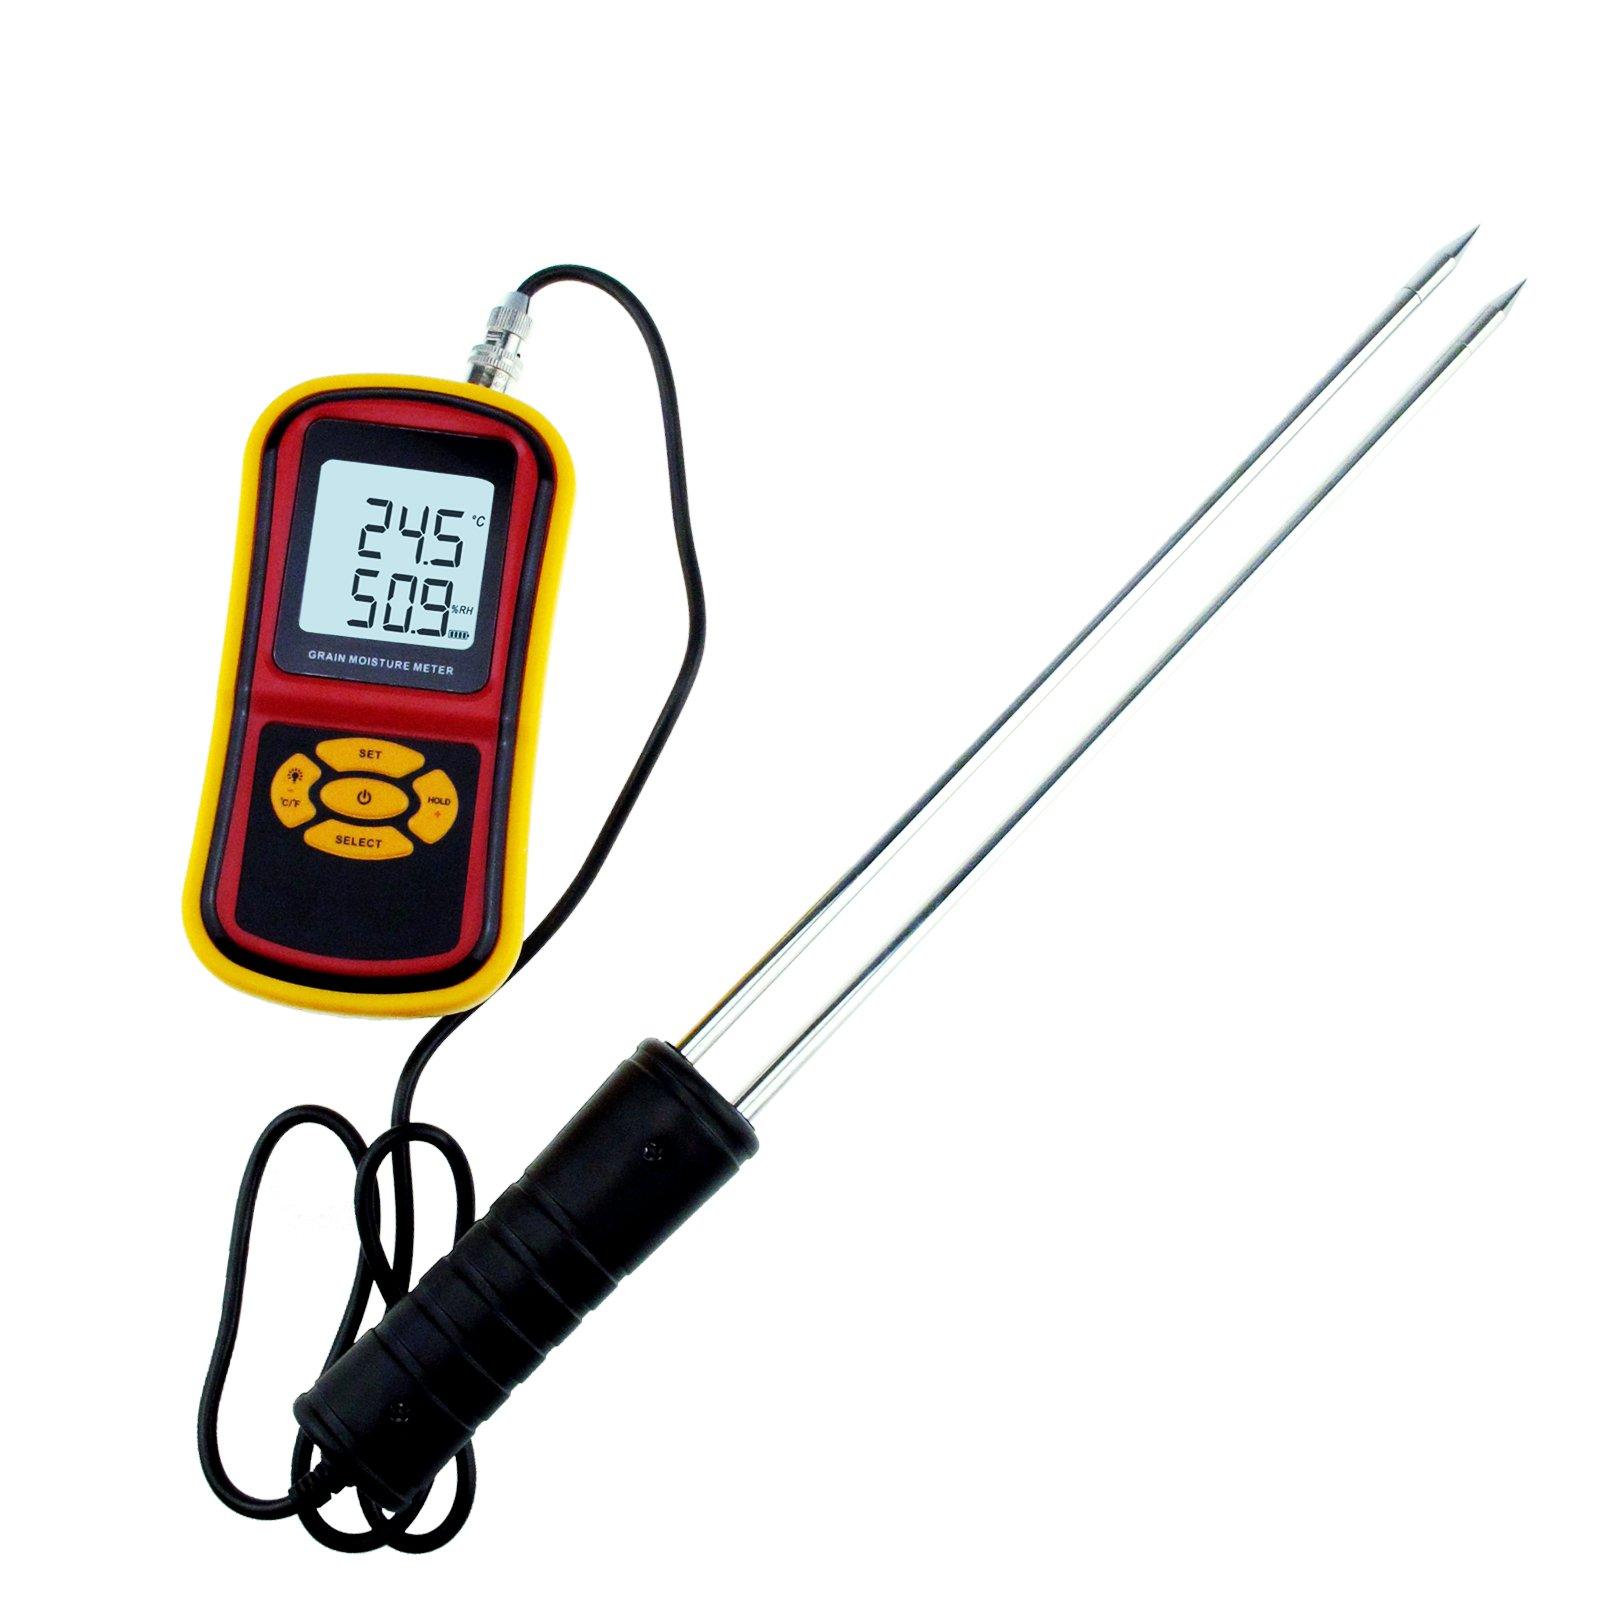 Portable Digital Grain Moisture Meter 5%~30% Temperature Measuring 10°C~60°C Hygrometer Humidity for Wheat Rice Soybean